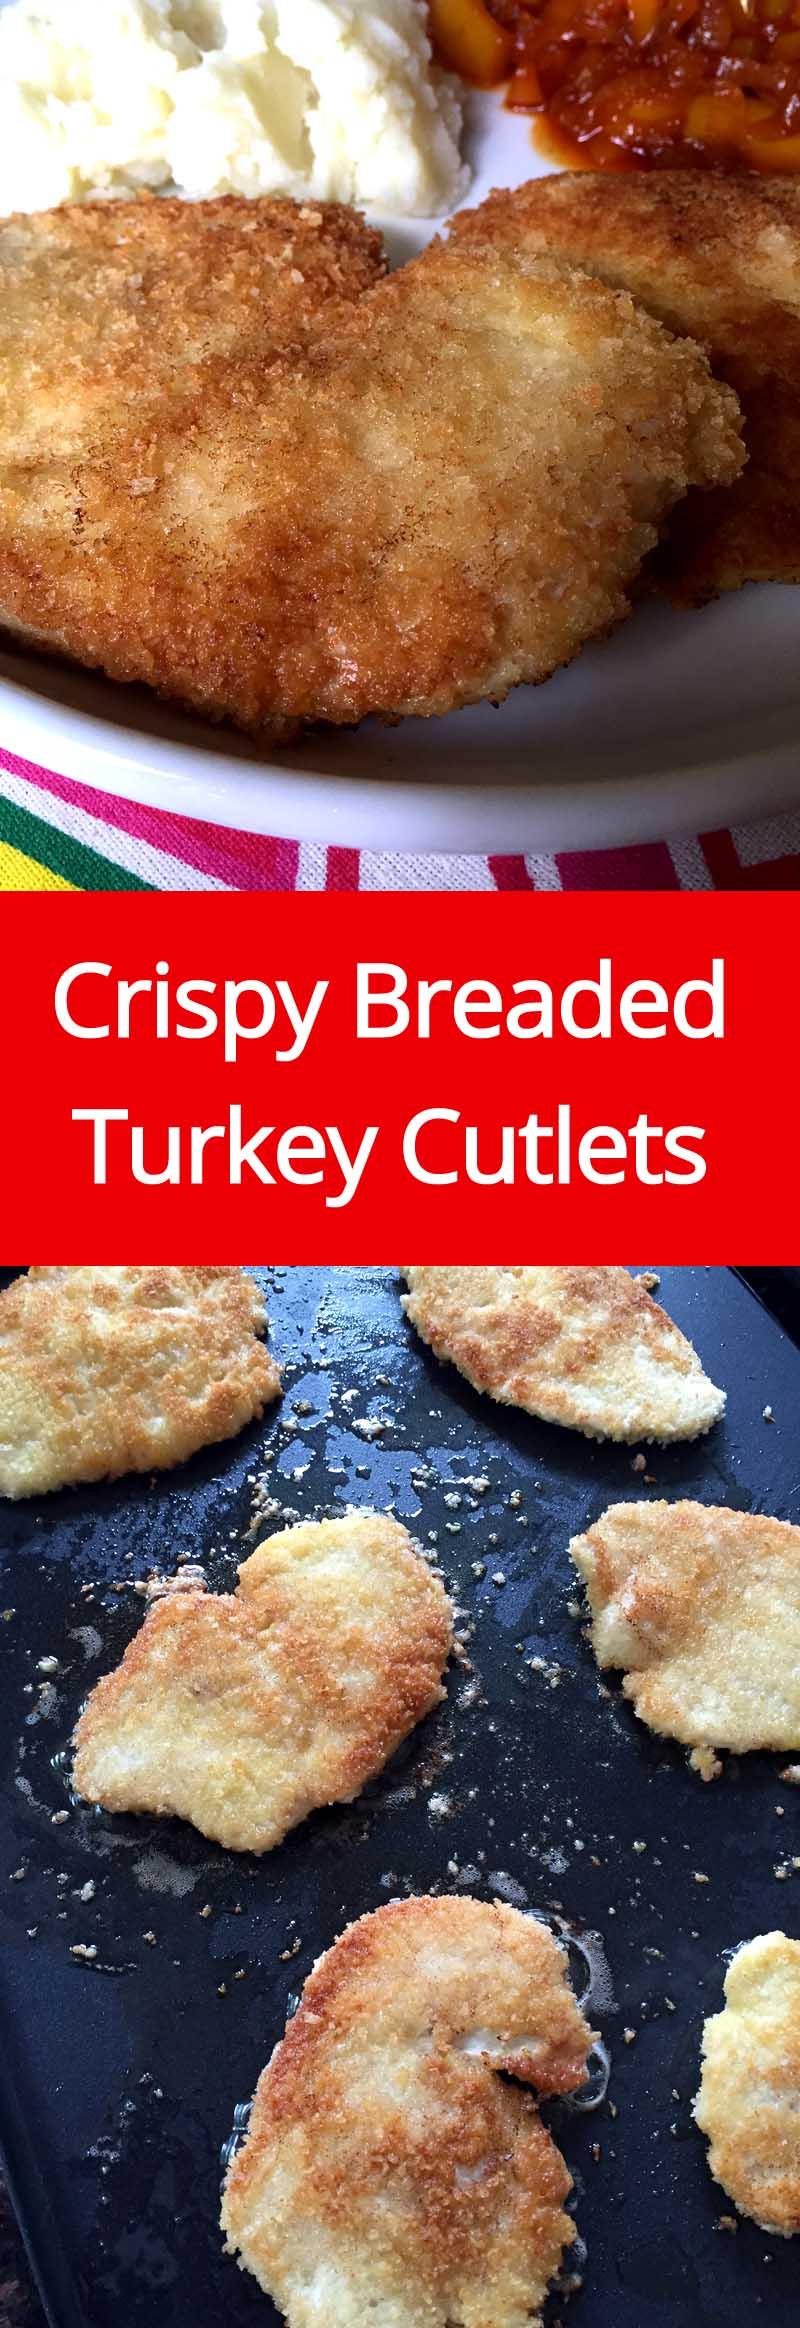 Crispy Panko Breaded Pan-Fried Turkey Cutlets Recipe | MelanieCooks.com